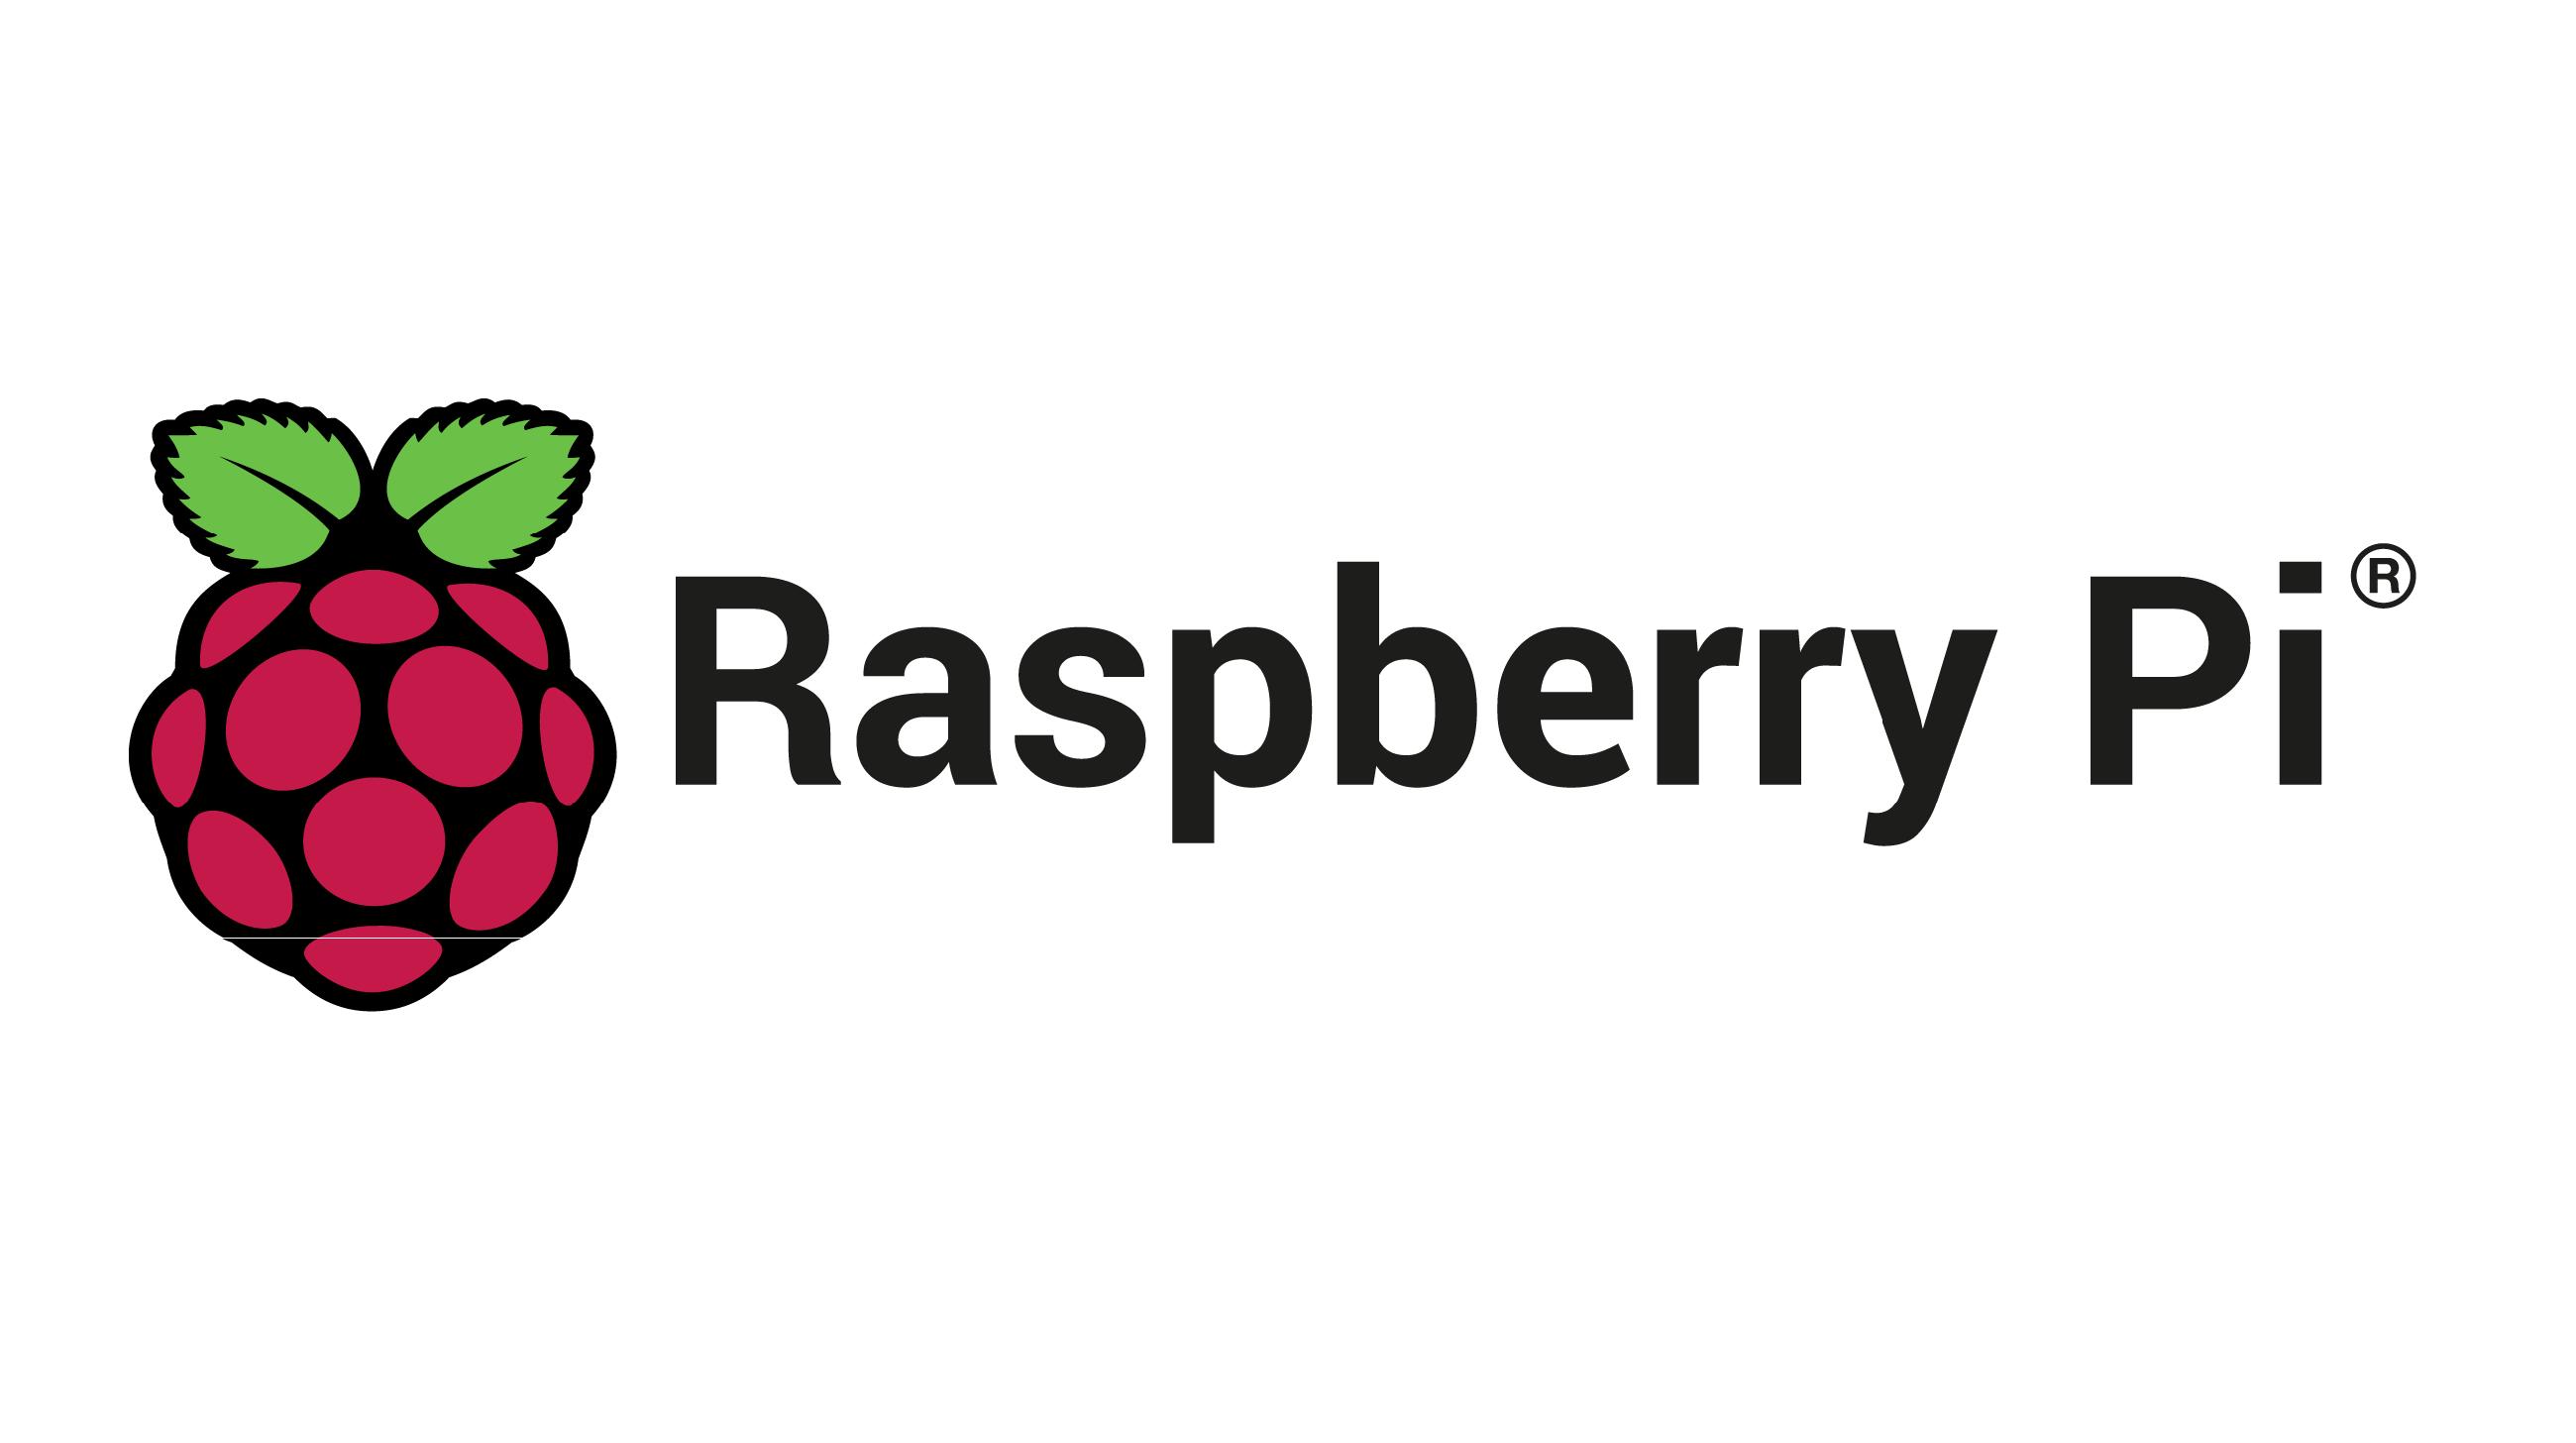 Linux kernel (for Raspberry pi)